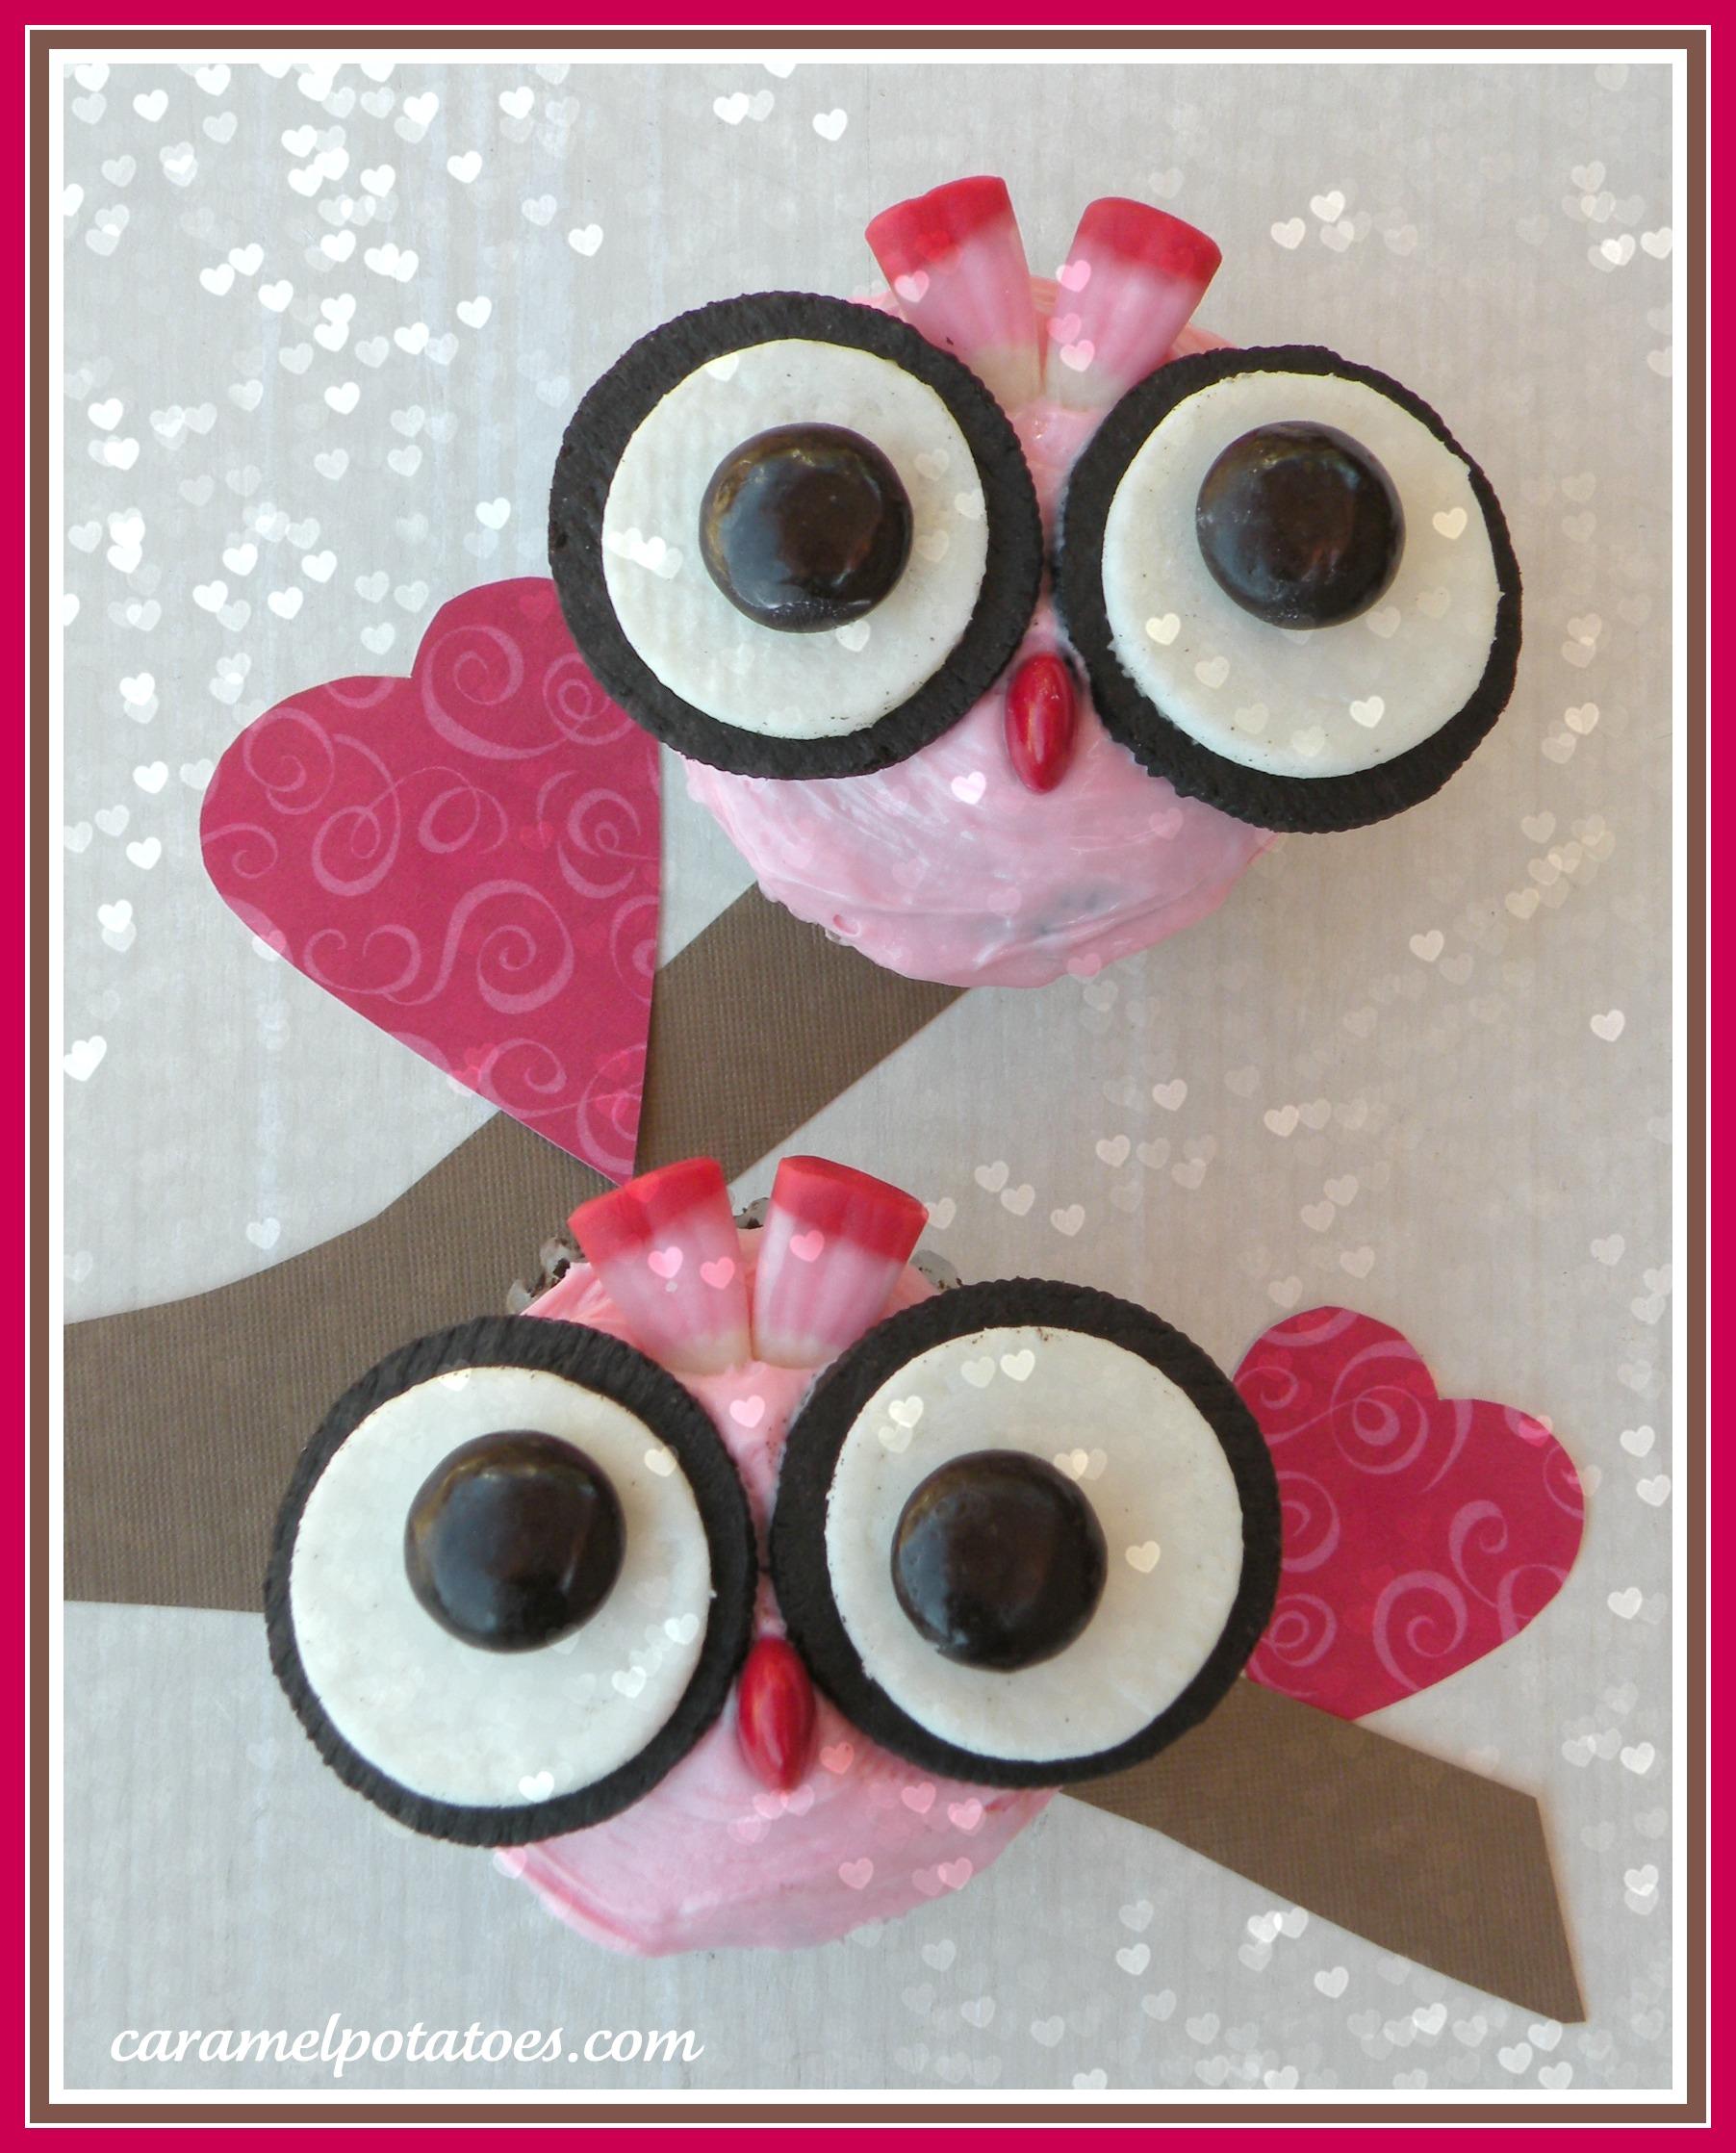 8 Photos of Owl Valentine's Day Cupcakes